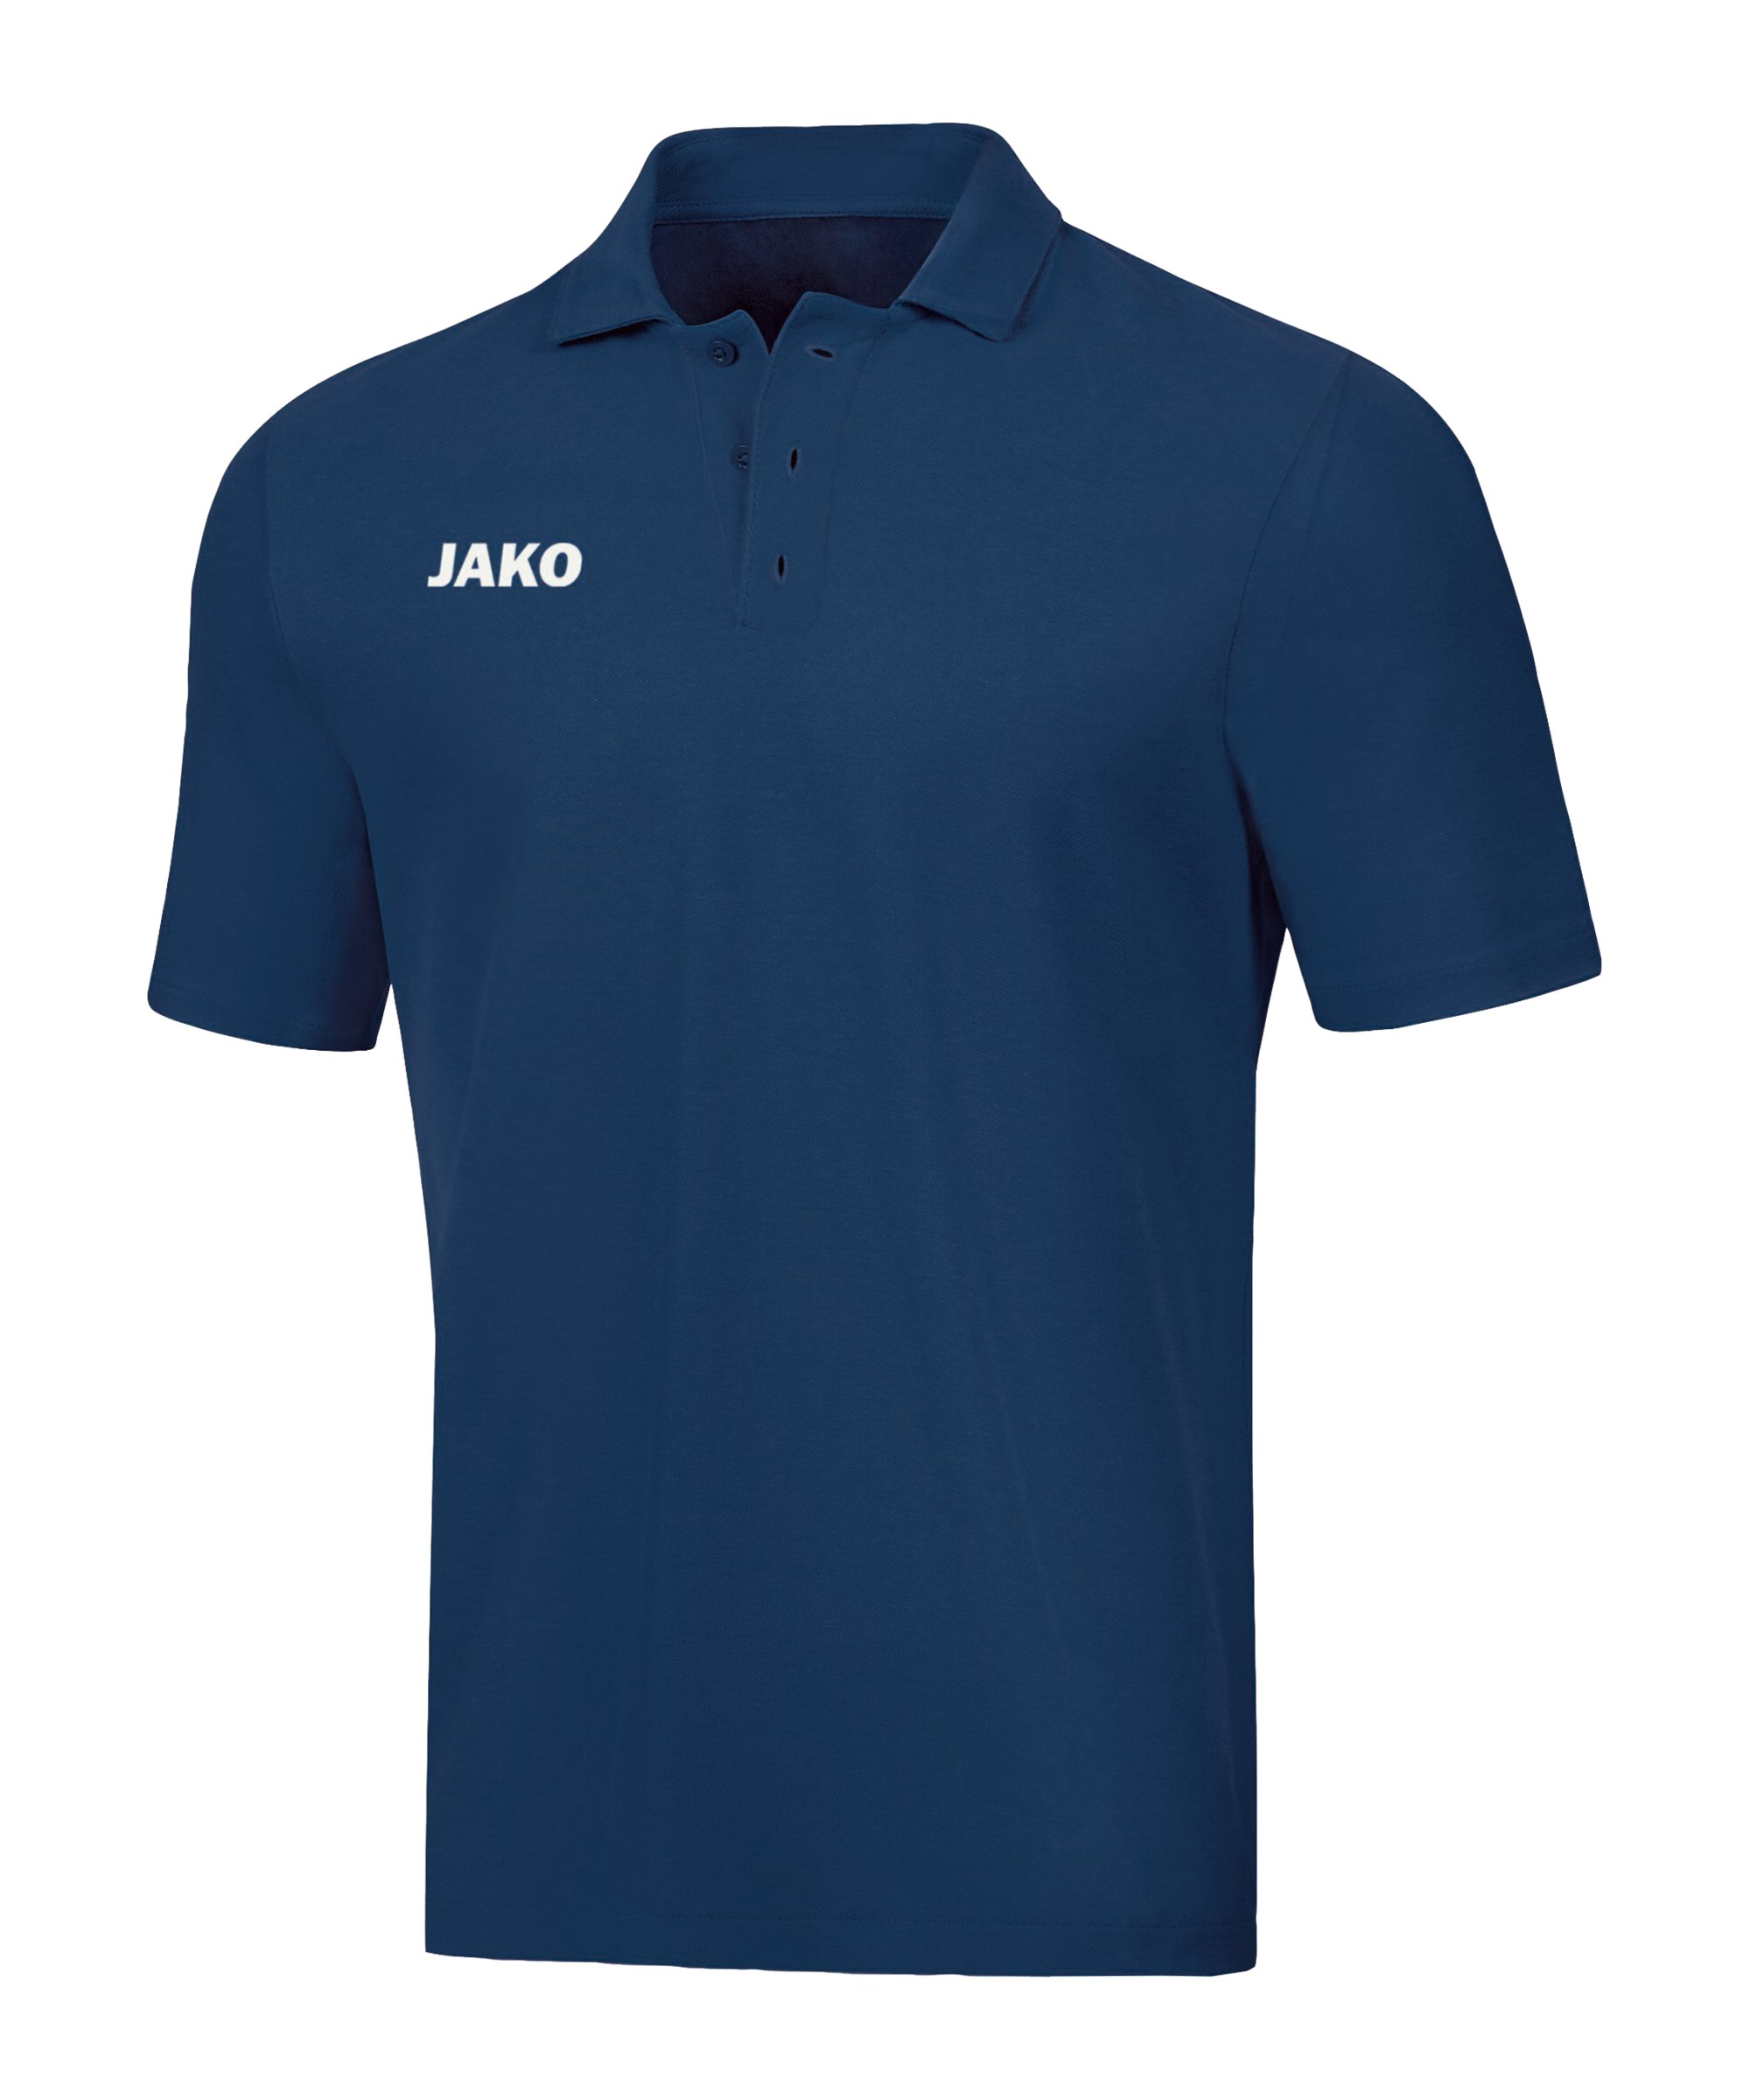 JAKO Base Poloshirt Blau F09 - blau